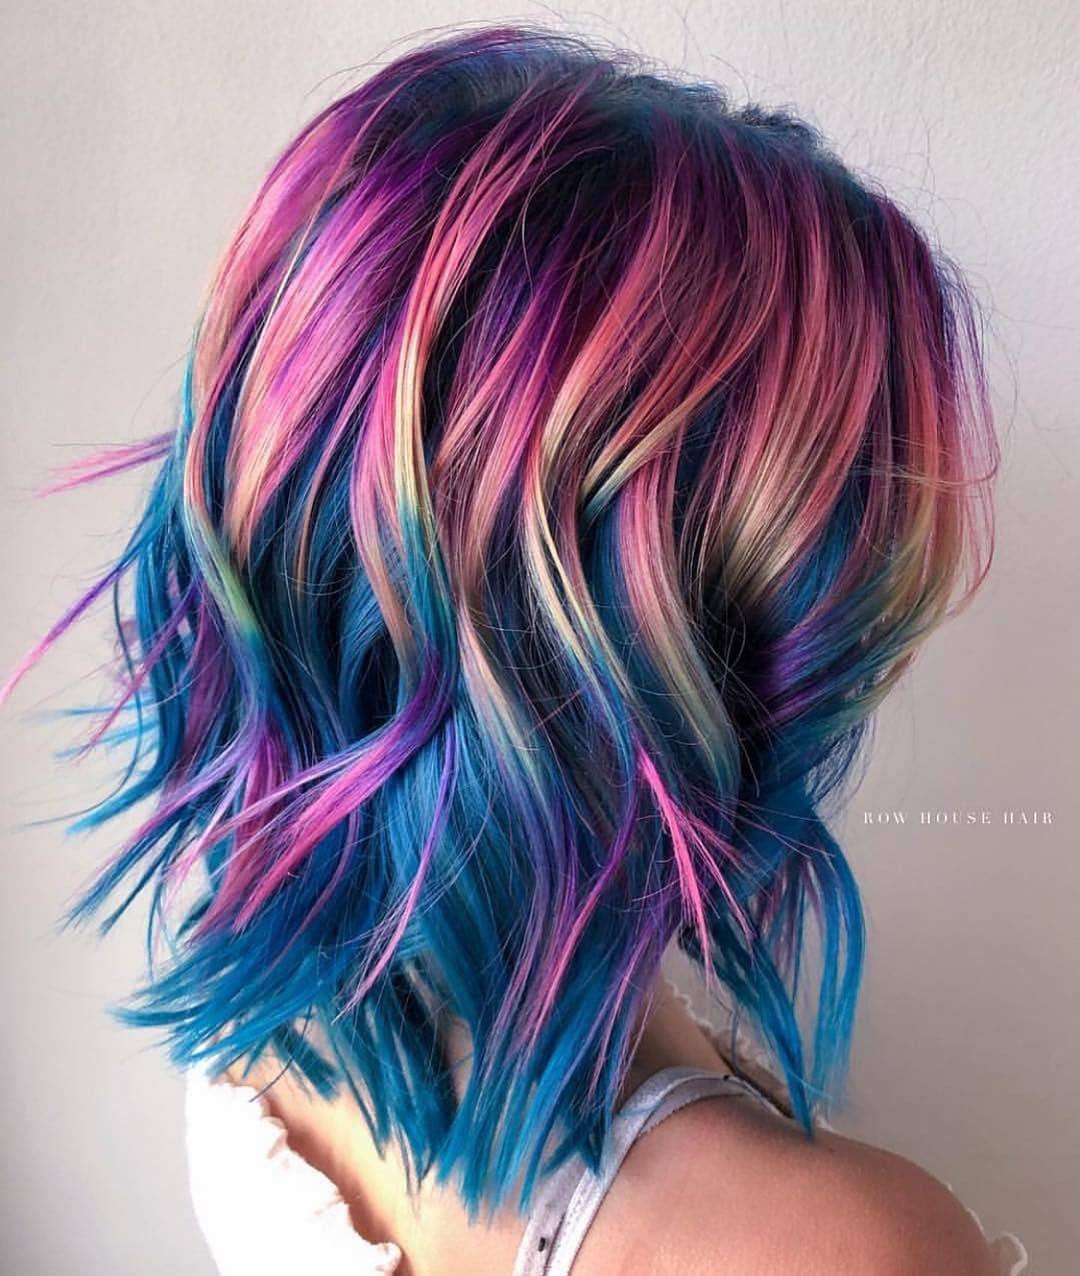 Unicorn Hair Multi Colored Hair Rainbow Hair Unicorn Rainbow Hair Rainbow Hair Color Red Ombre Hair Hair Color Red Ombre